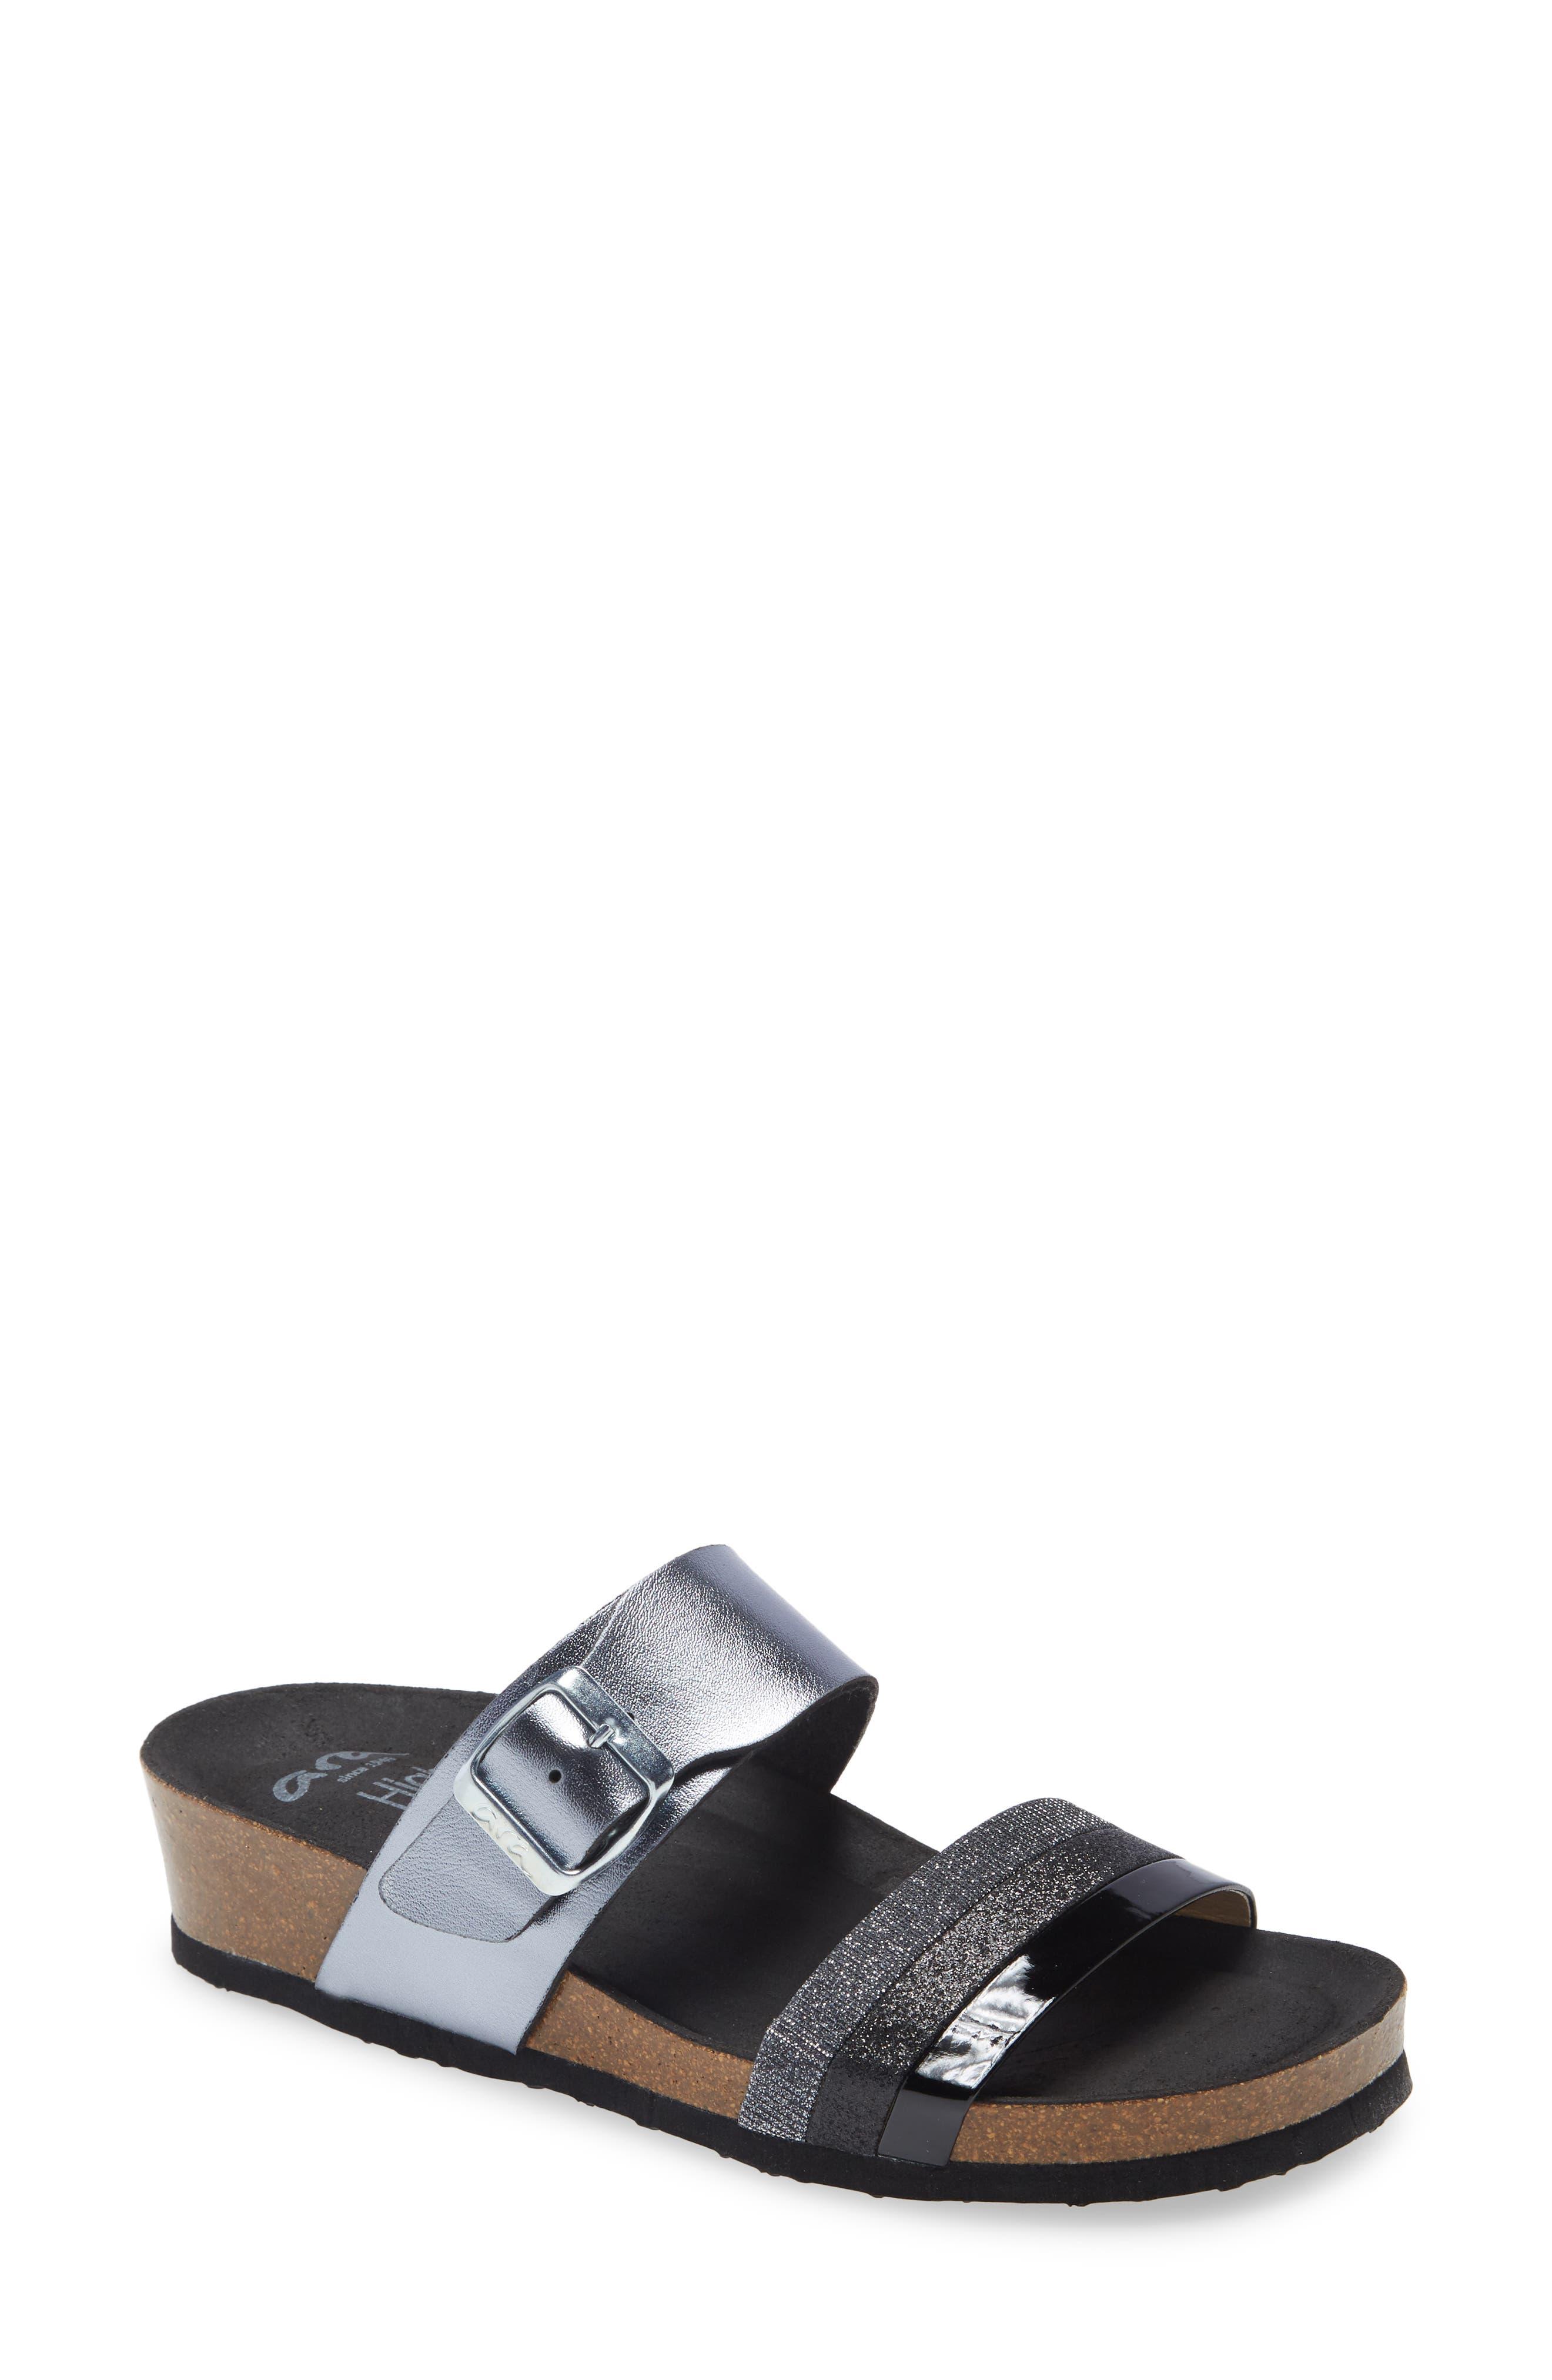 Bonnie Slide Sandal